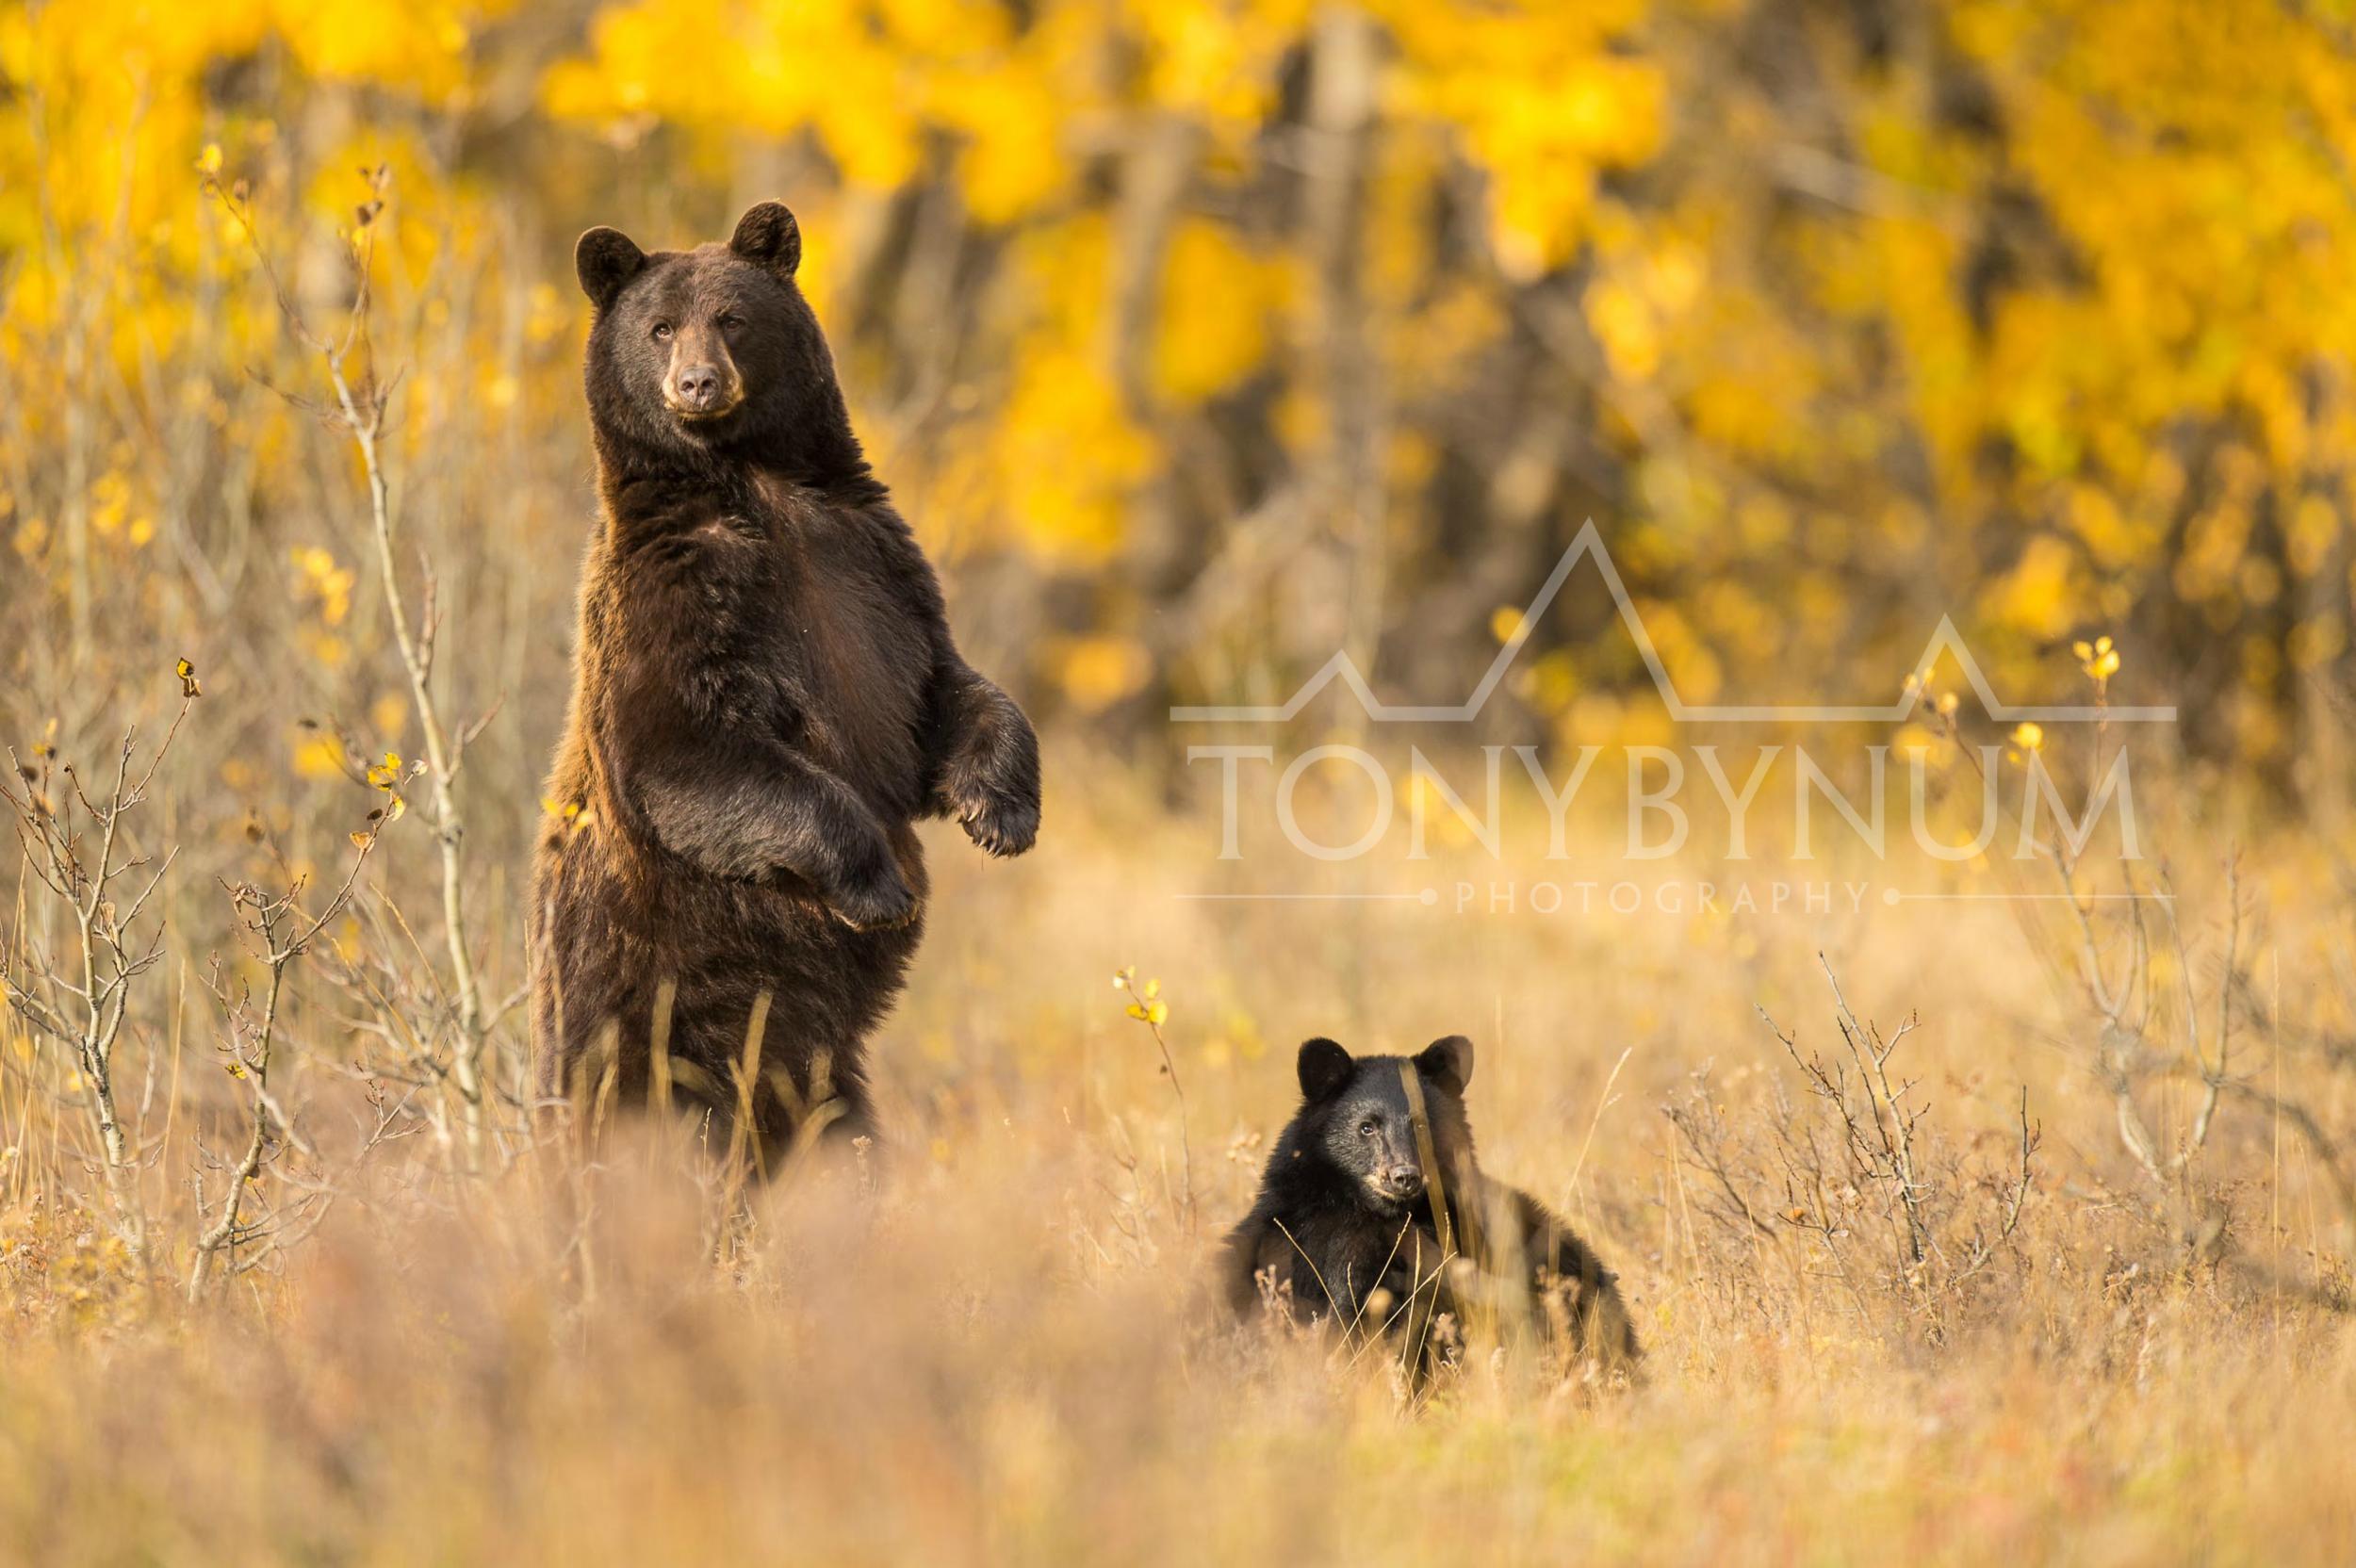 tony-bynum-black-bears